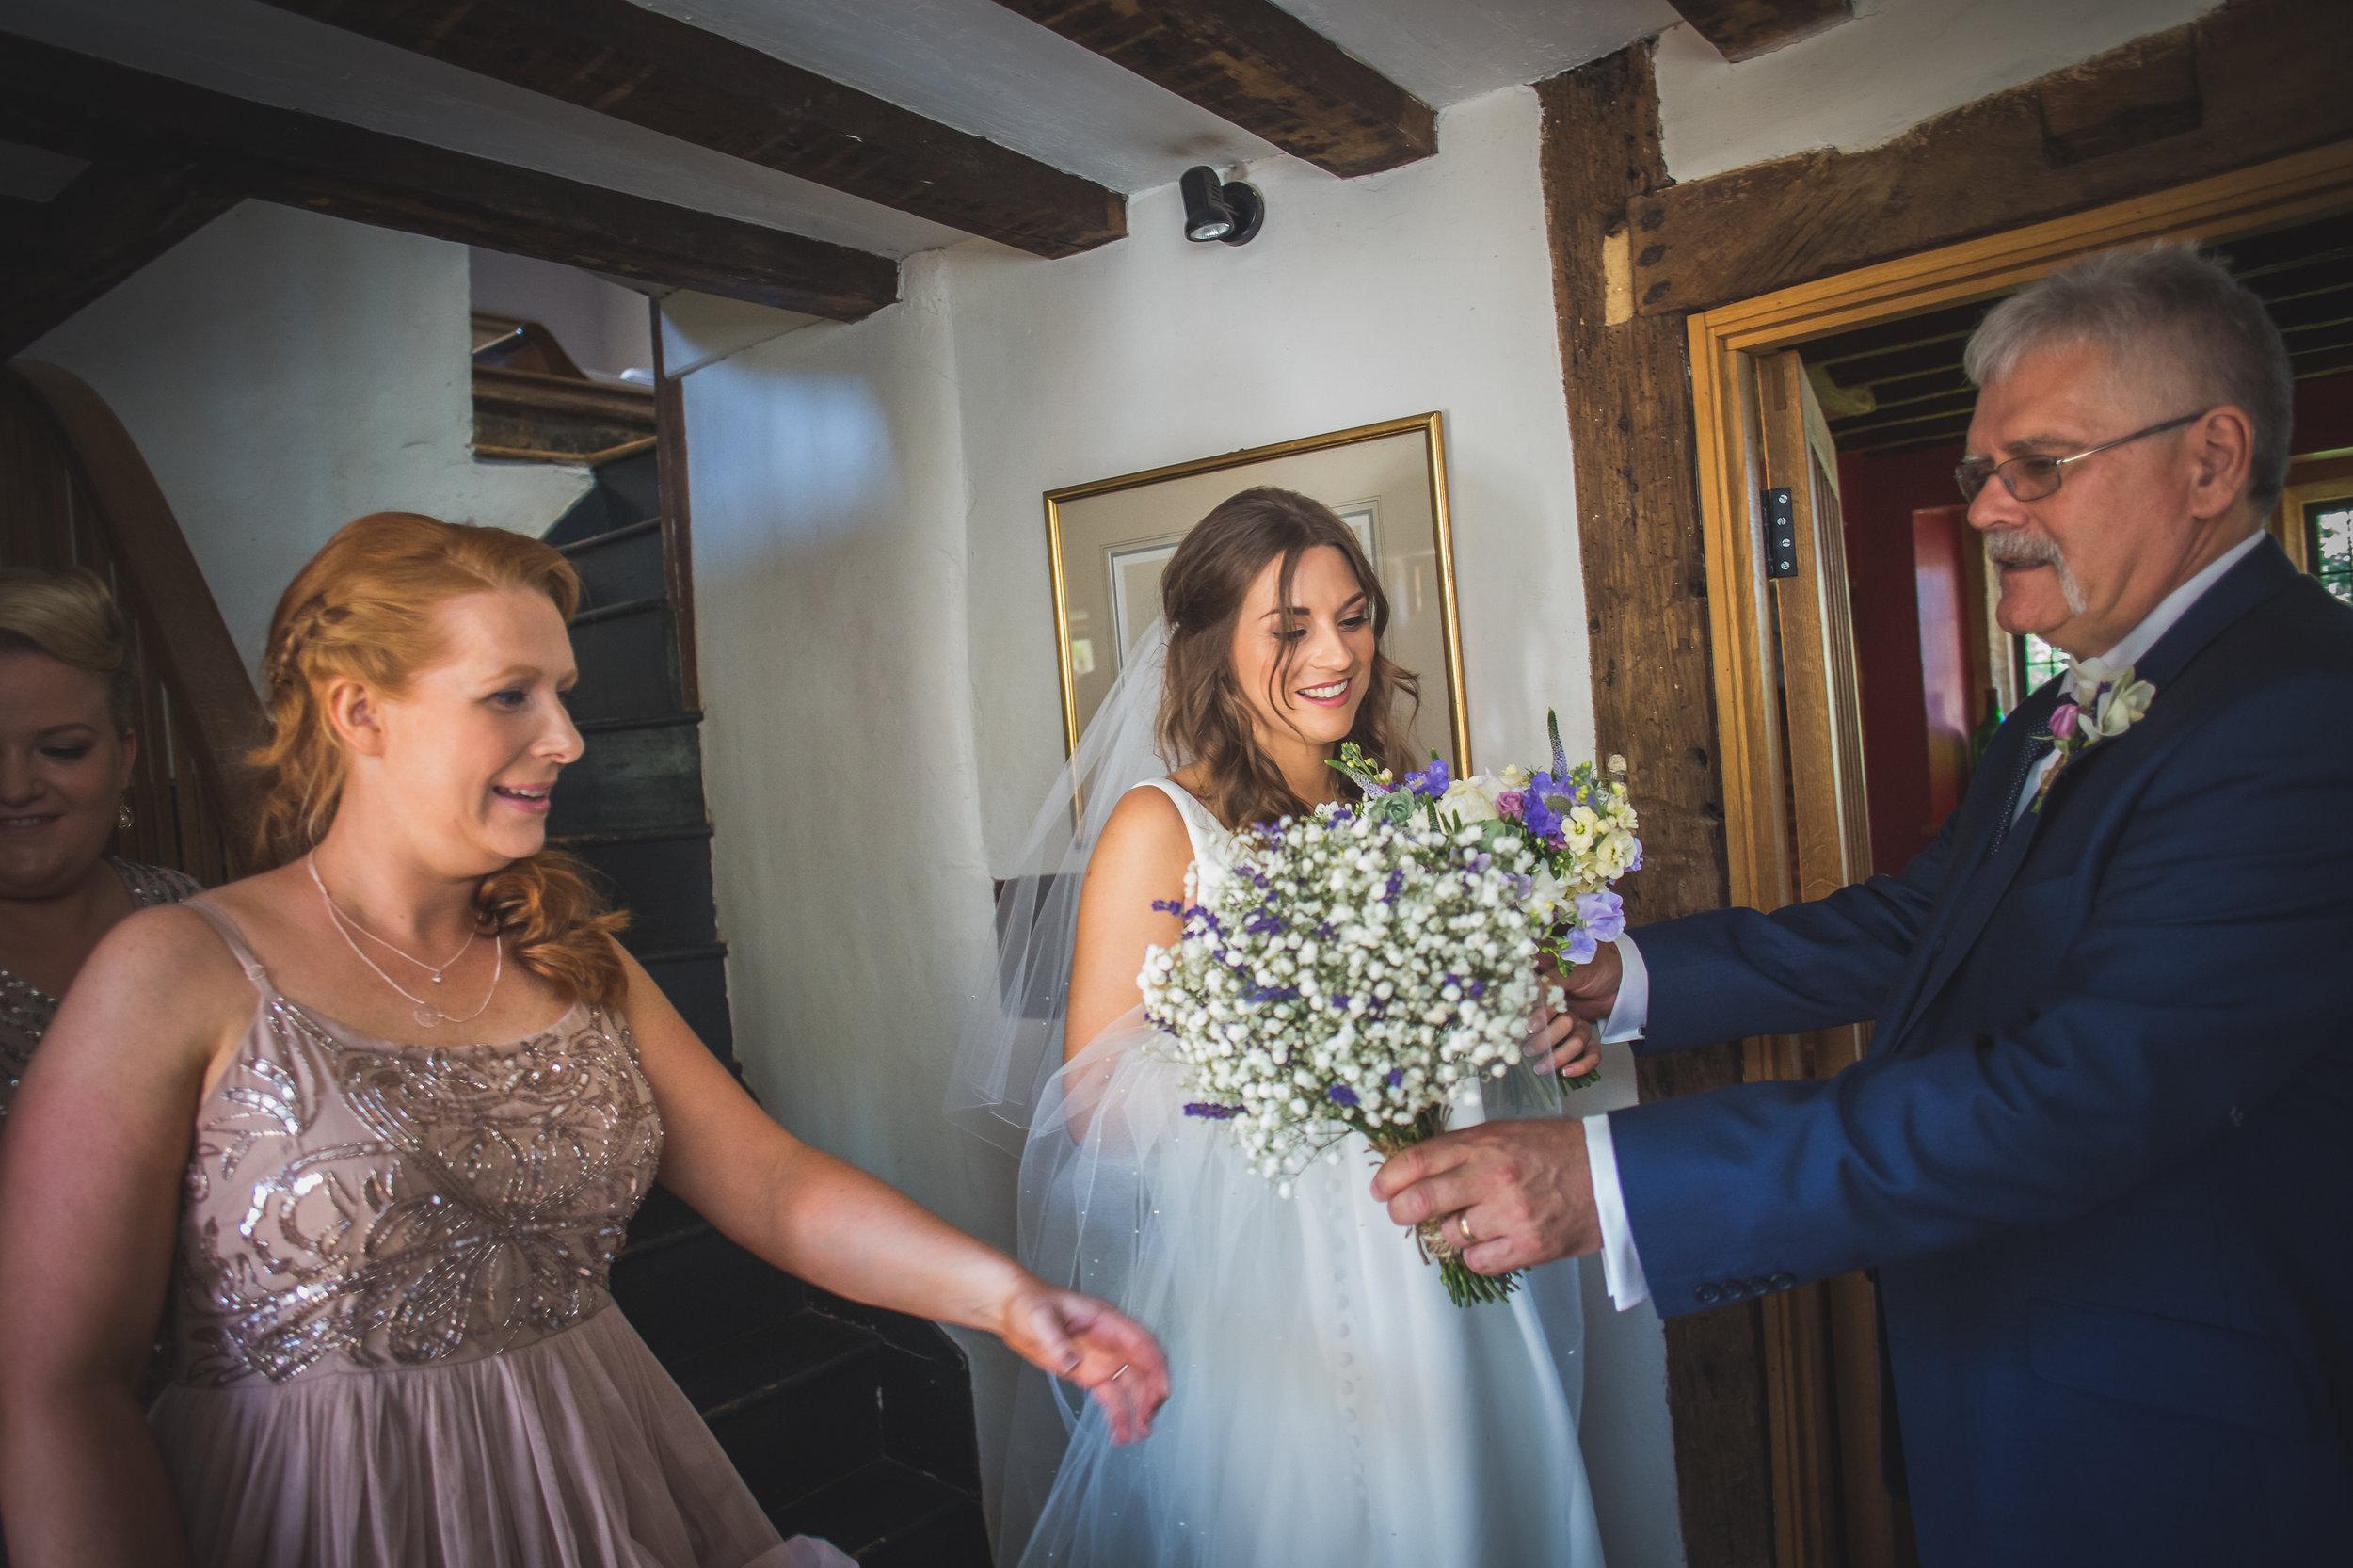 Grittenham Barn female wedding photographers west sussex petworth social-40.jpg